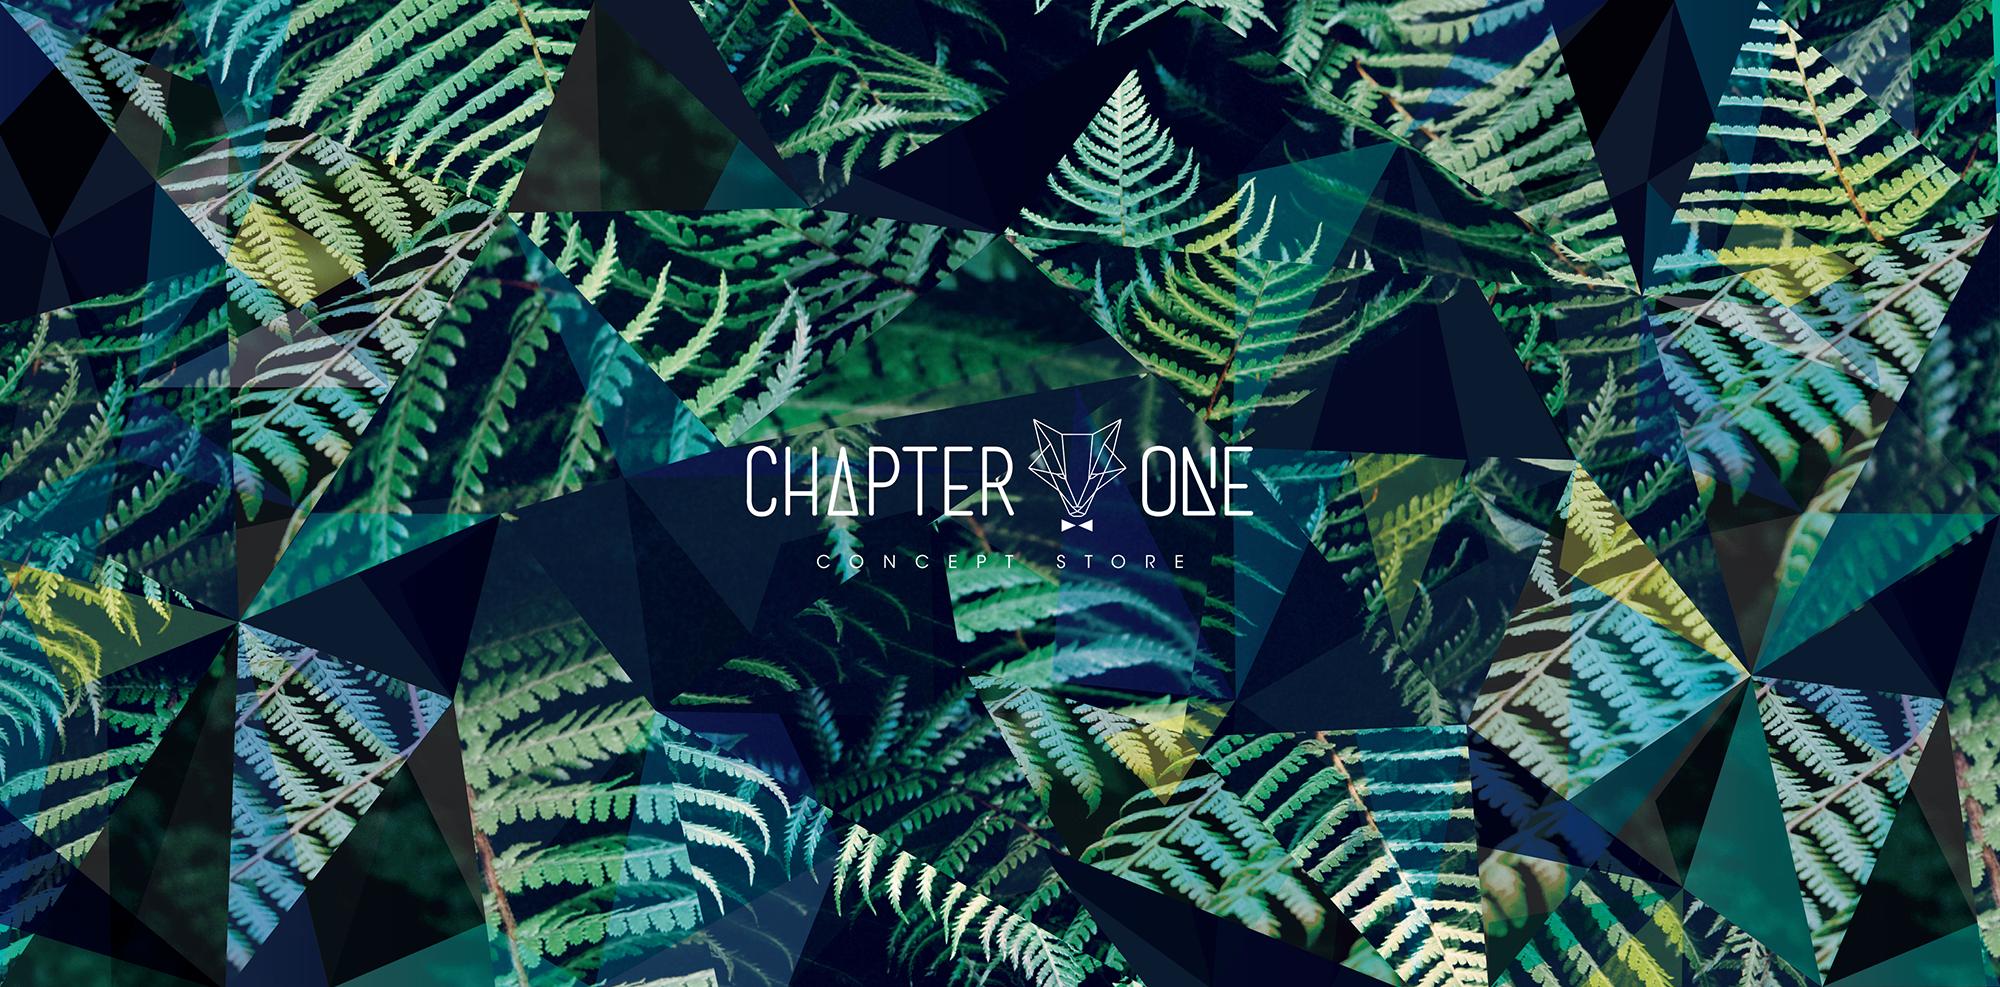 Vlevle-chapter_one-Visual_Identity-logo-graphic_design-gaelle_de_laveleye